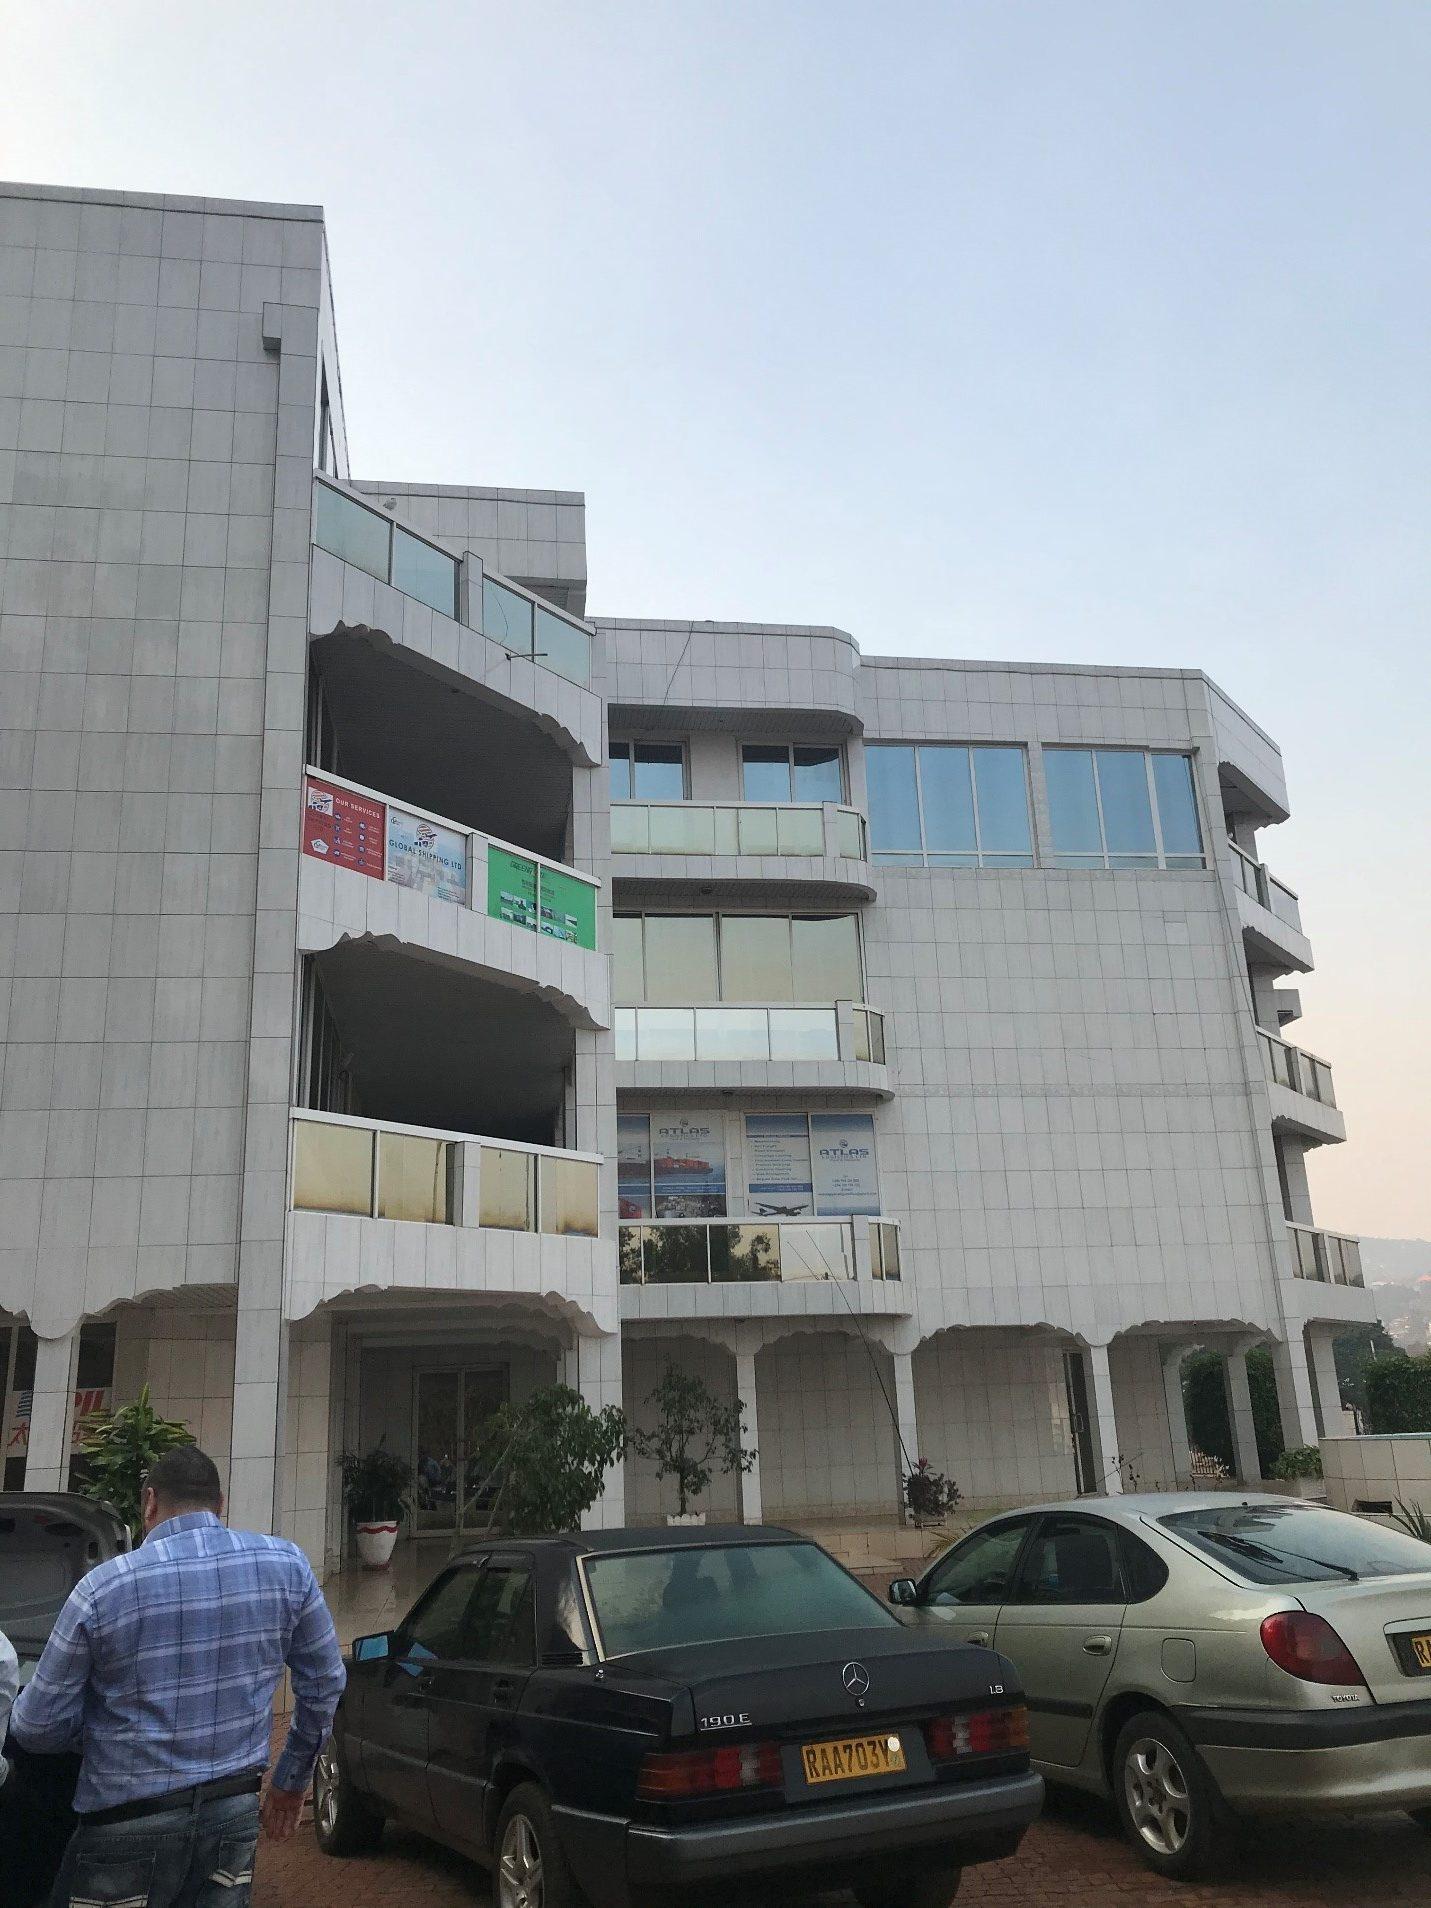 A colour photograph of an office building.